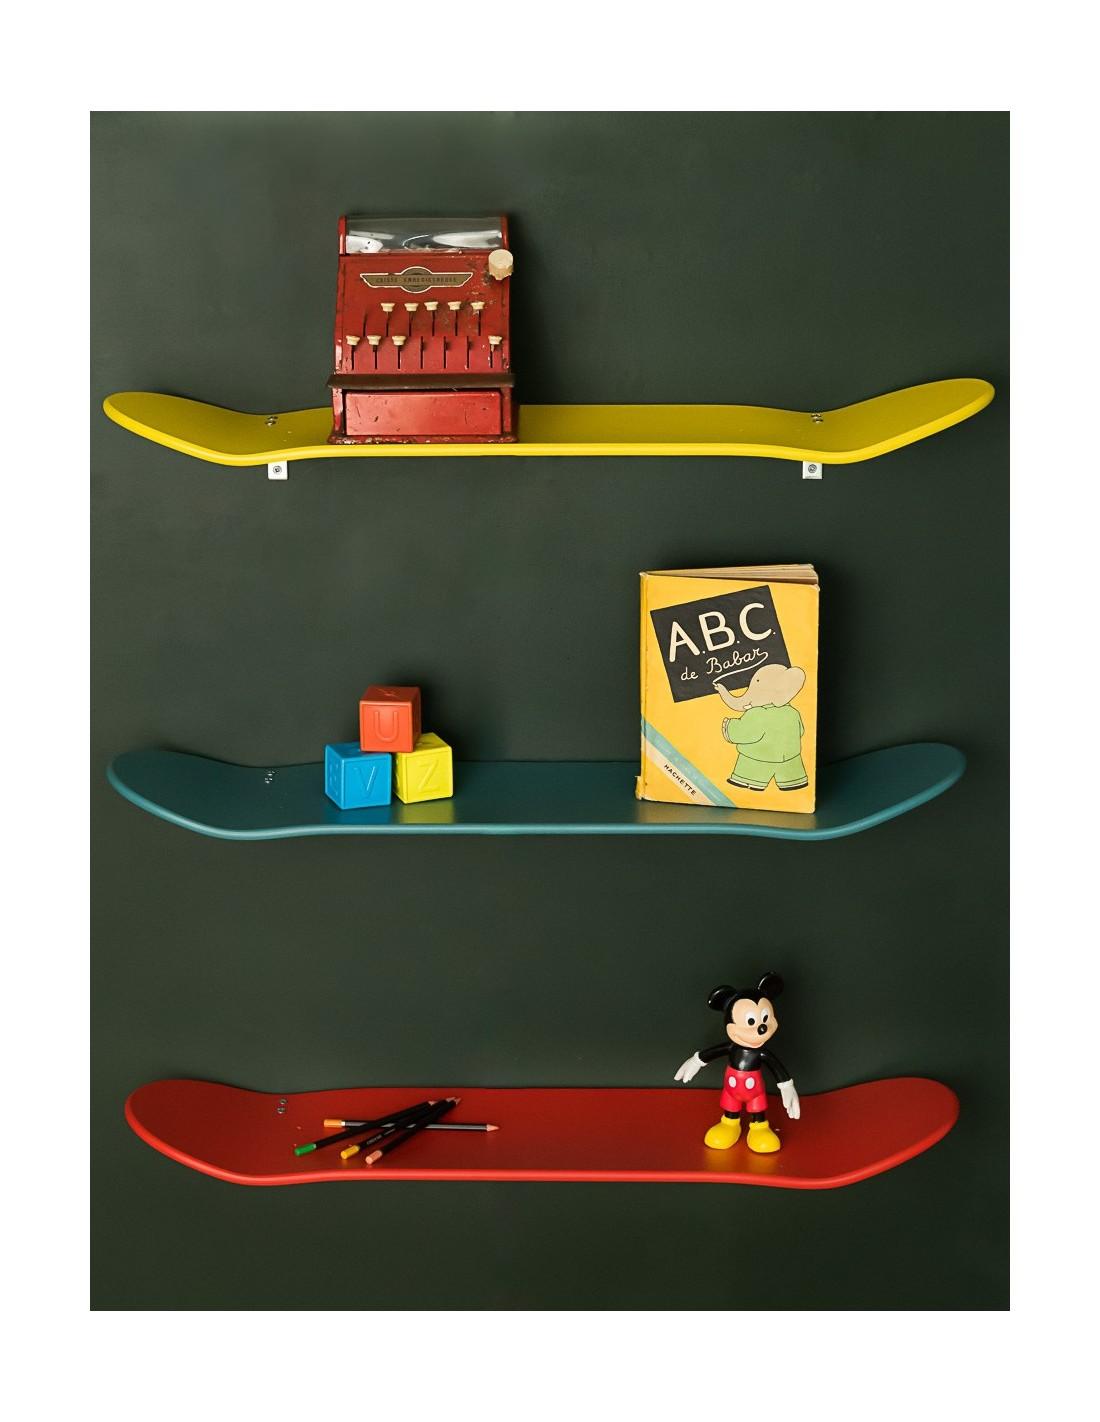 etag re murale skate board rouge le ons de choses. Black Bedroom Furniture Sets. Home Design Ideas